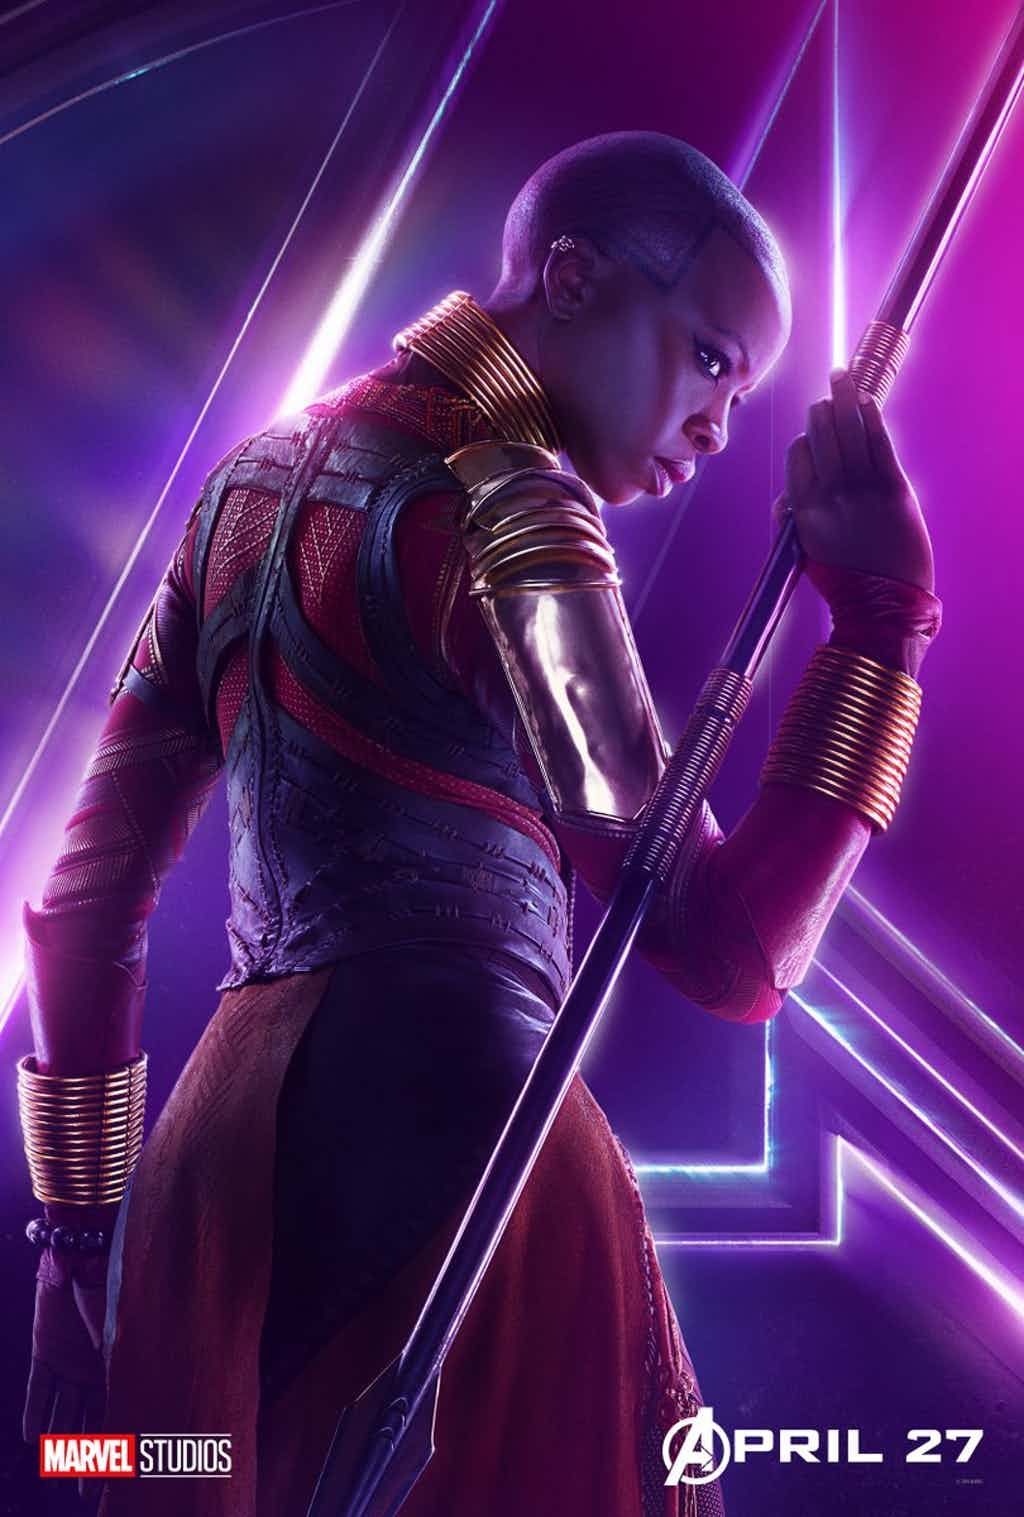 szmk_marvel_infinity_war_vegtelen_haboru_bosszuallok_avengers_ironman_hulk_thor_captainamaerica_guardians_galaxy_12.jpg